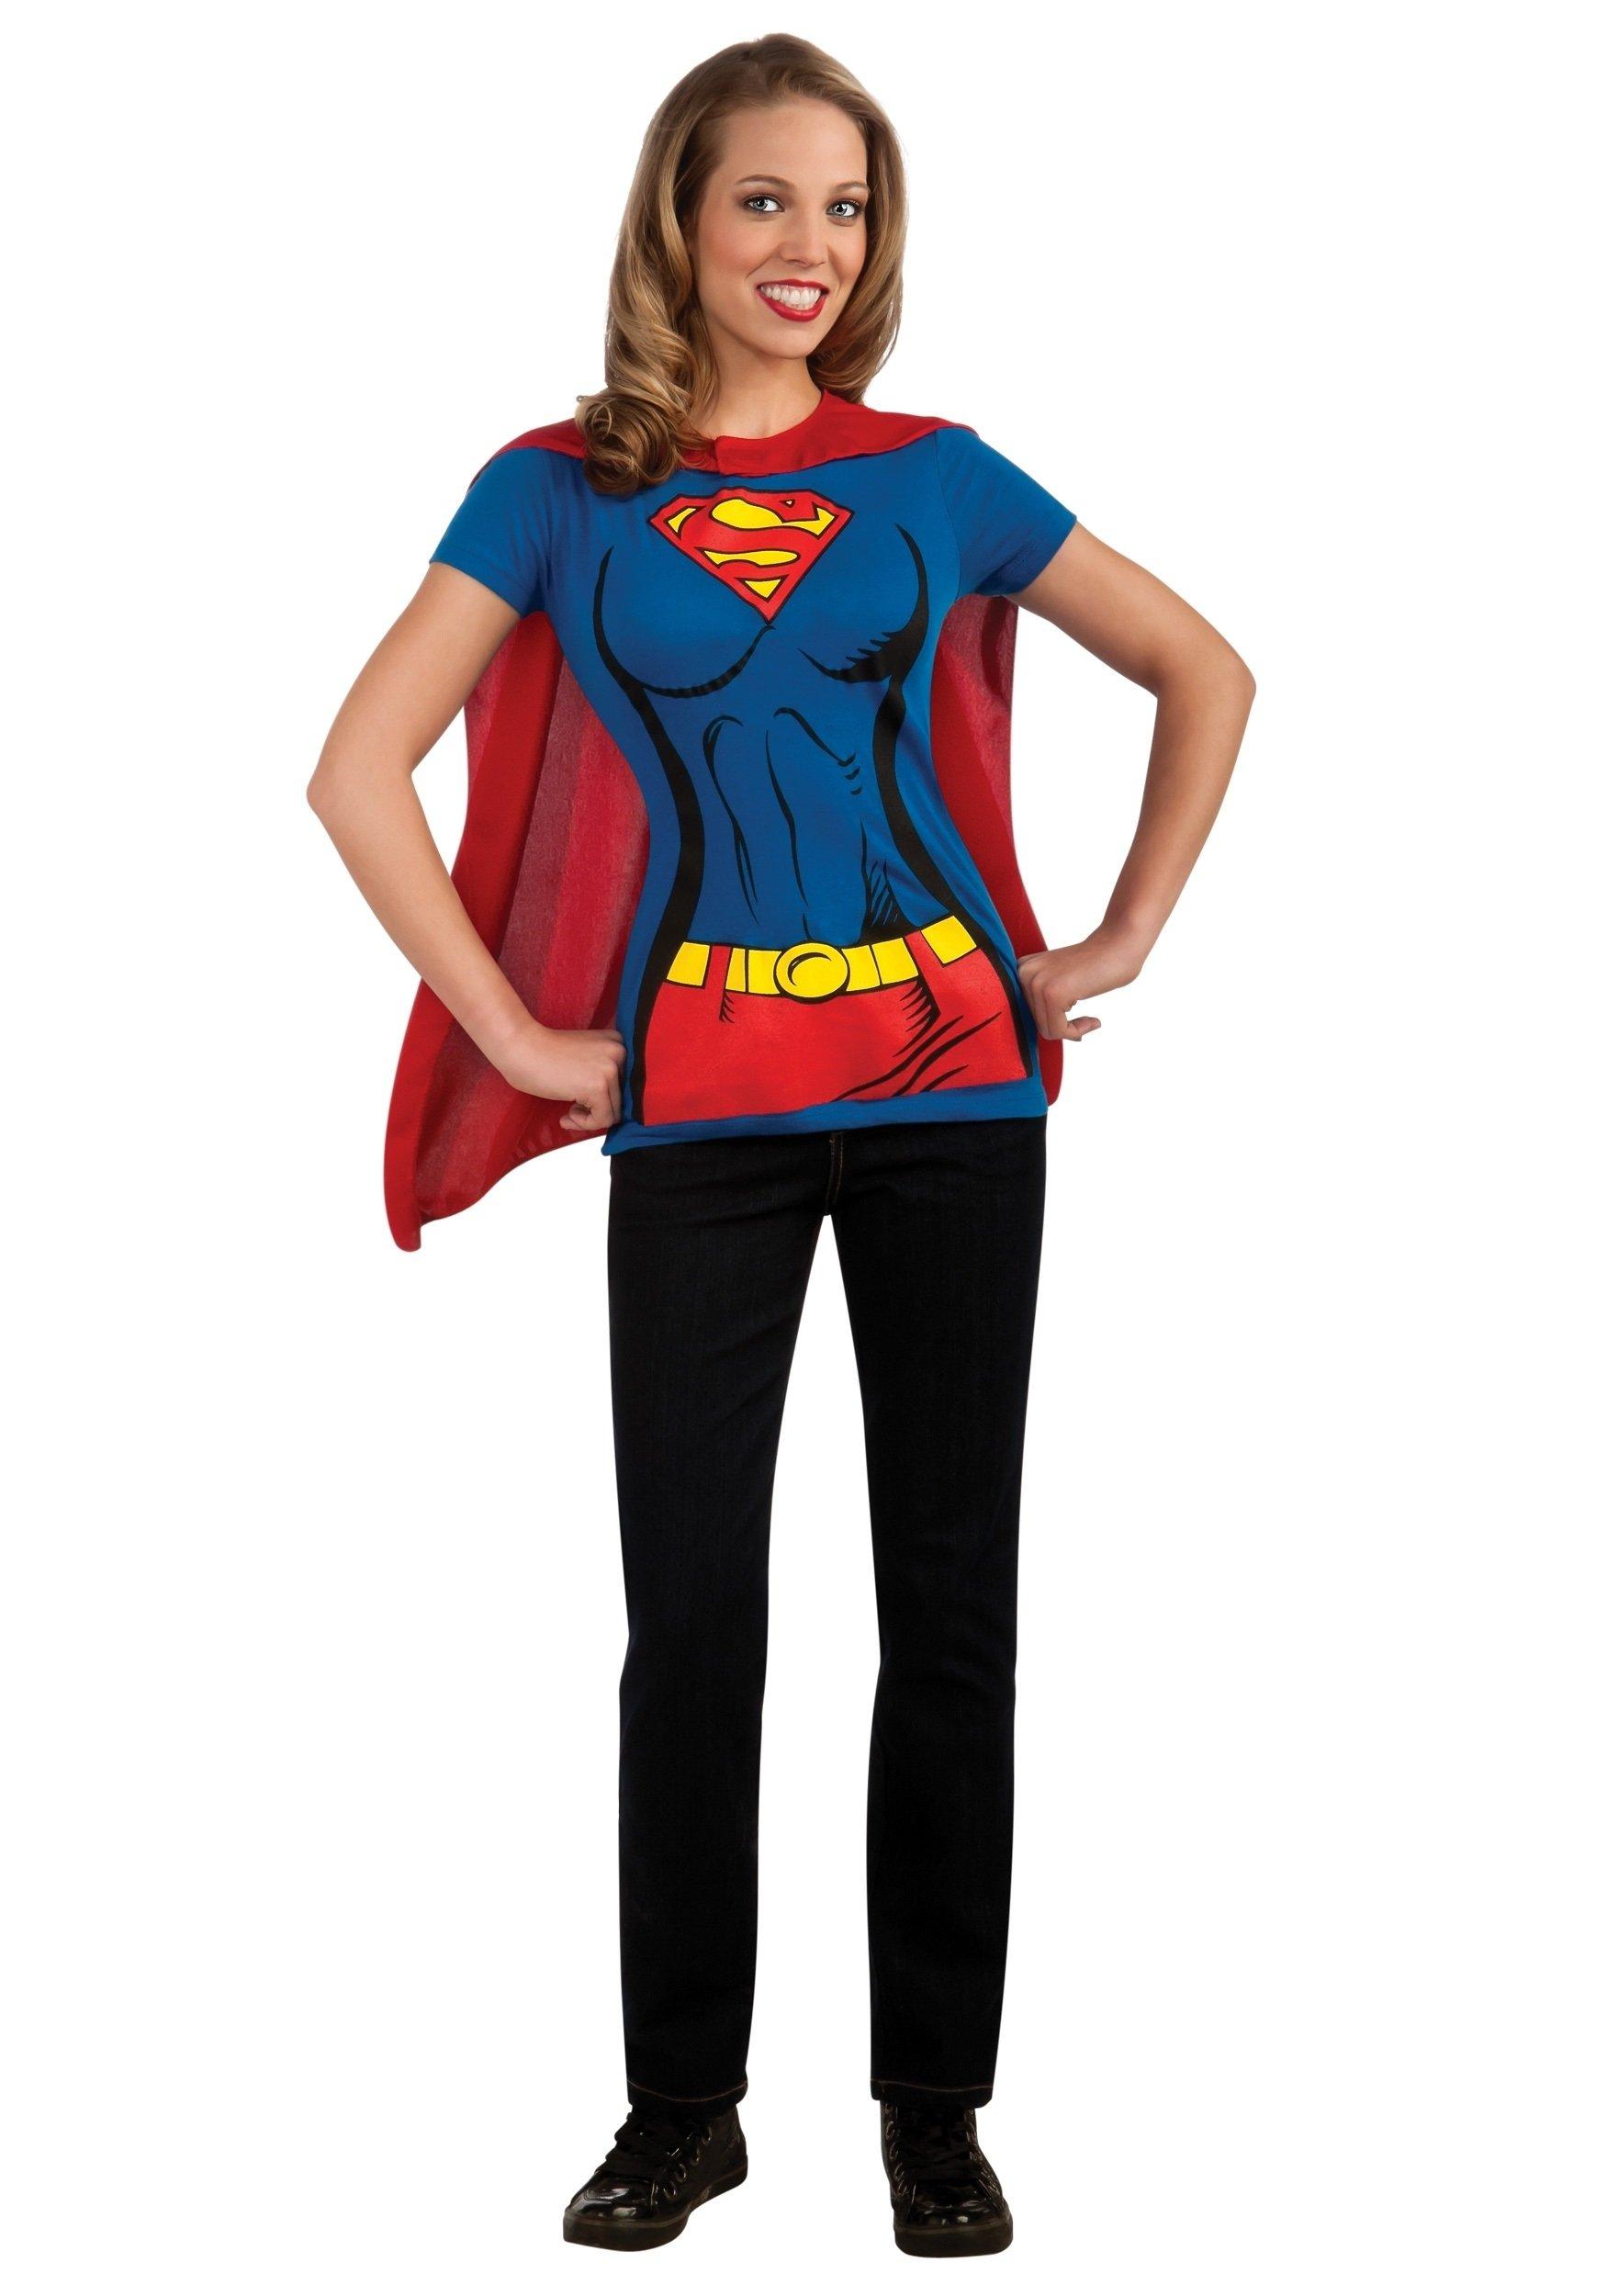 10 Stylish Movie Costume Ideas For Women supergirl t shirt costume easy superhero costume ideas 2021